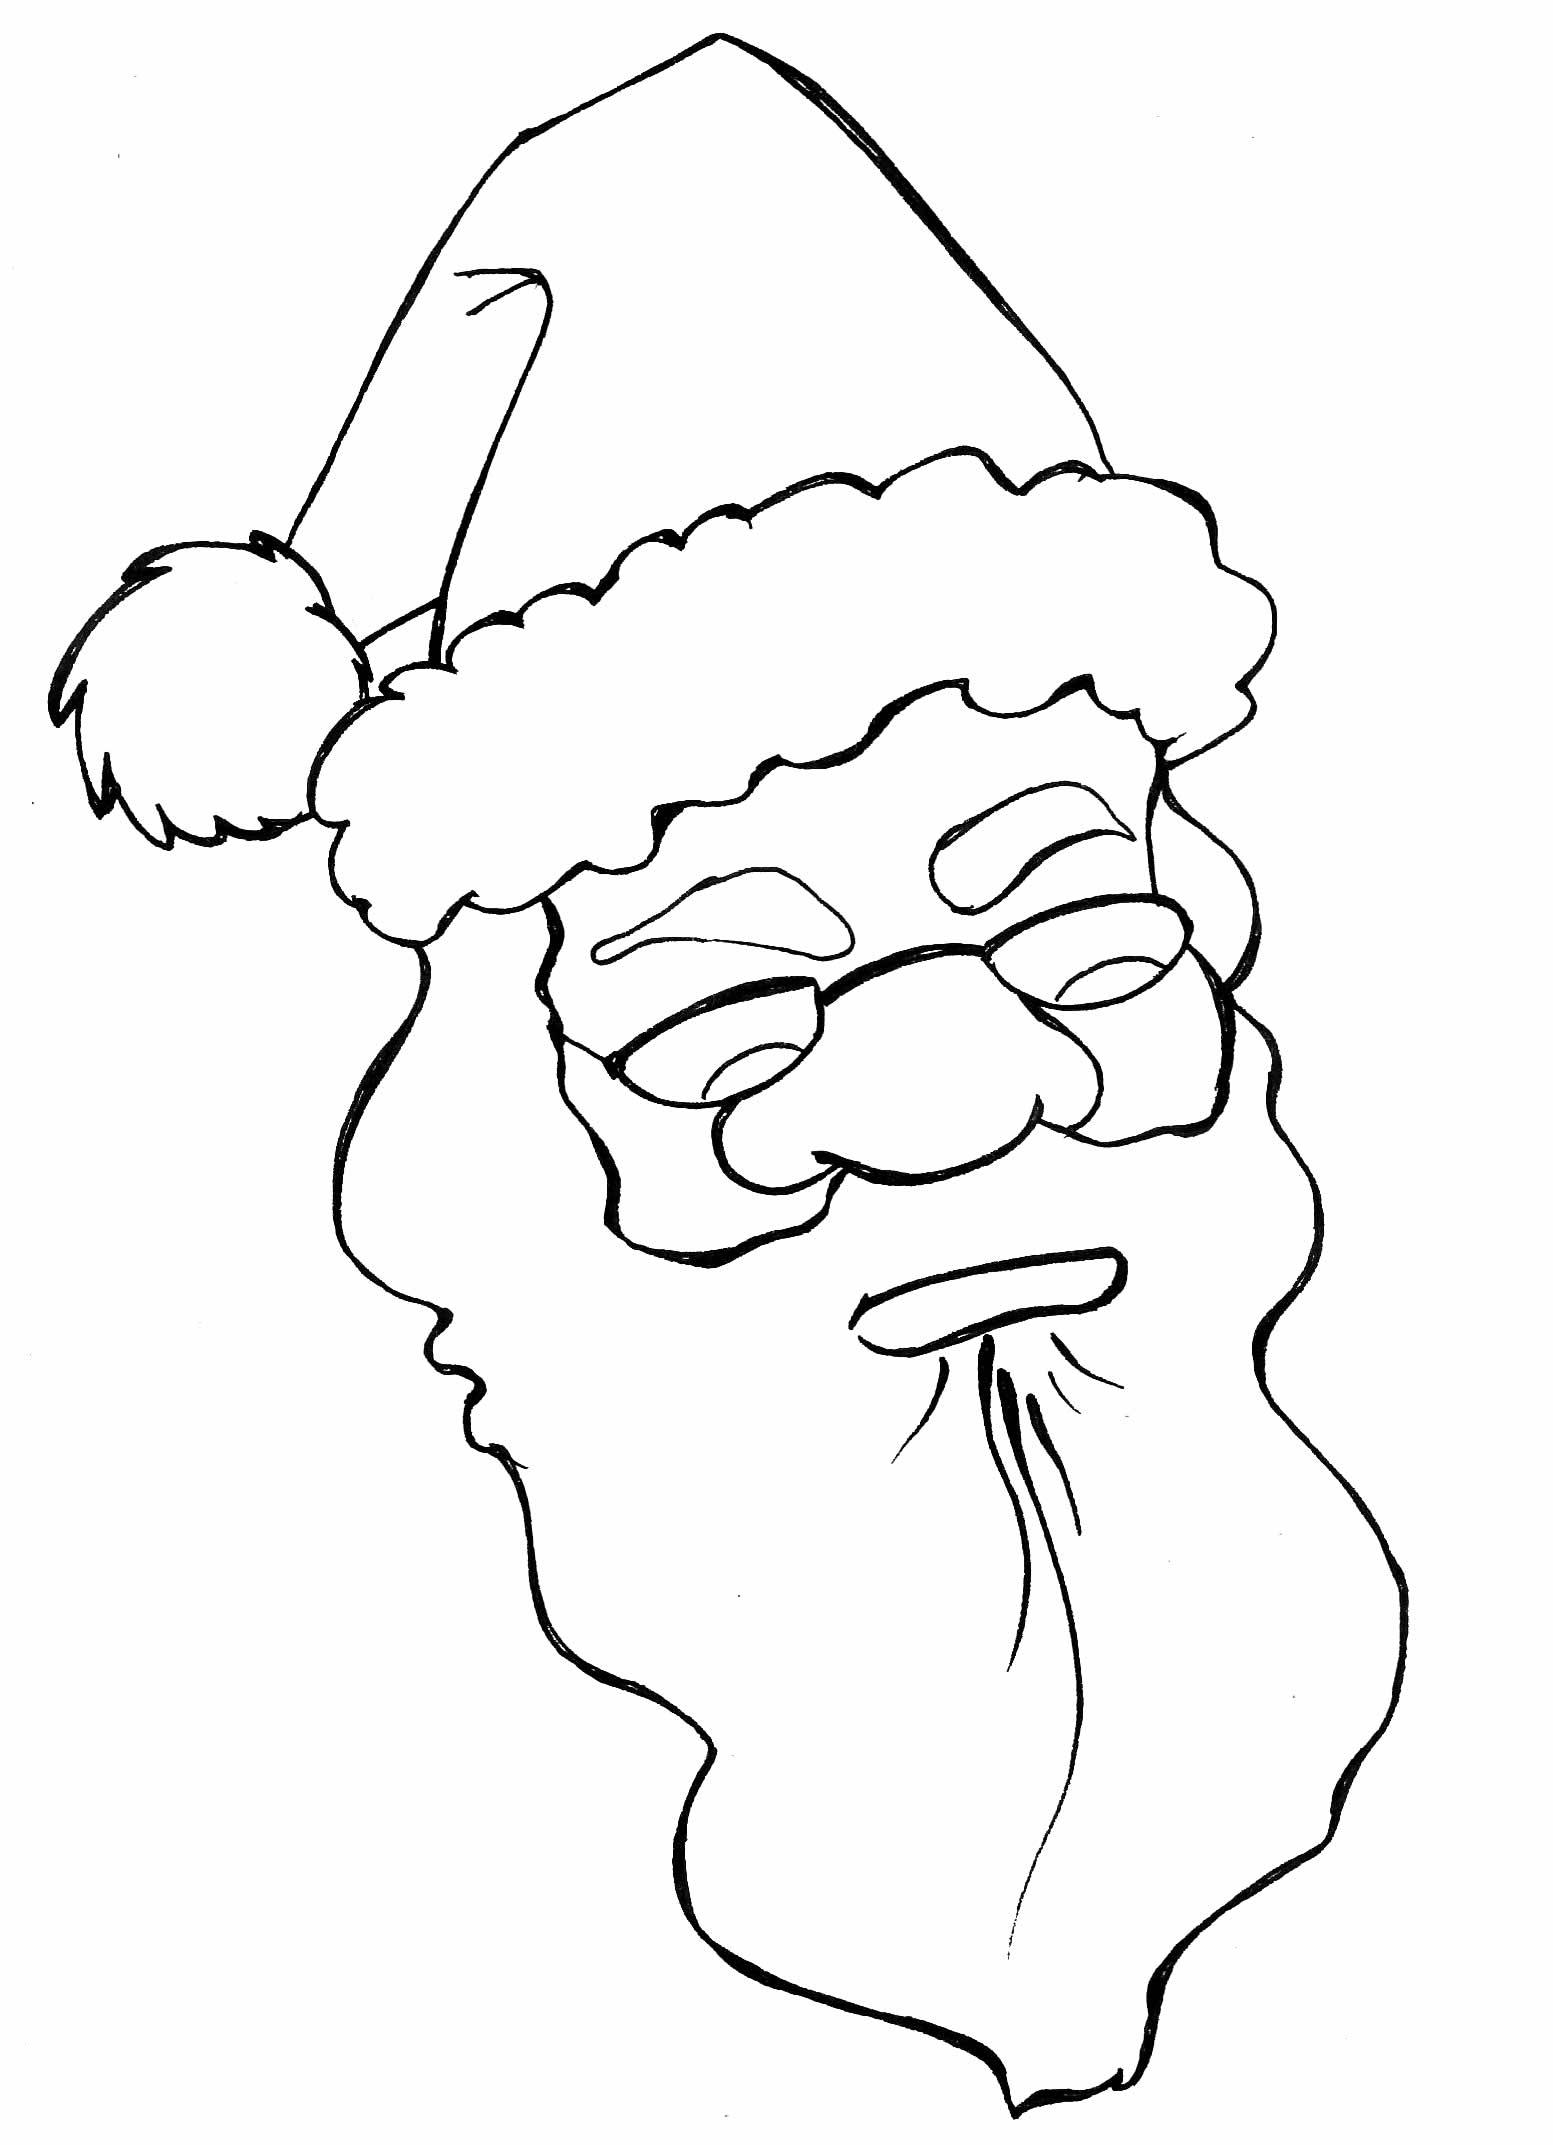 Desenho fofo de Papai Noel